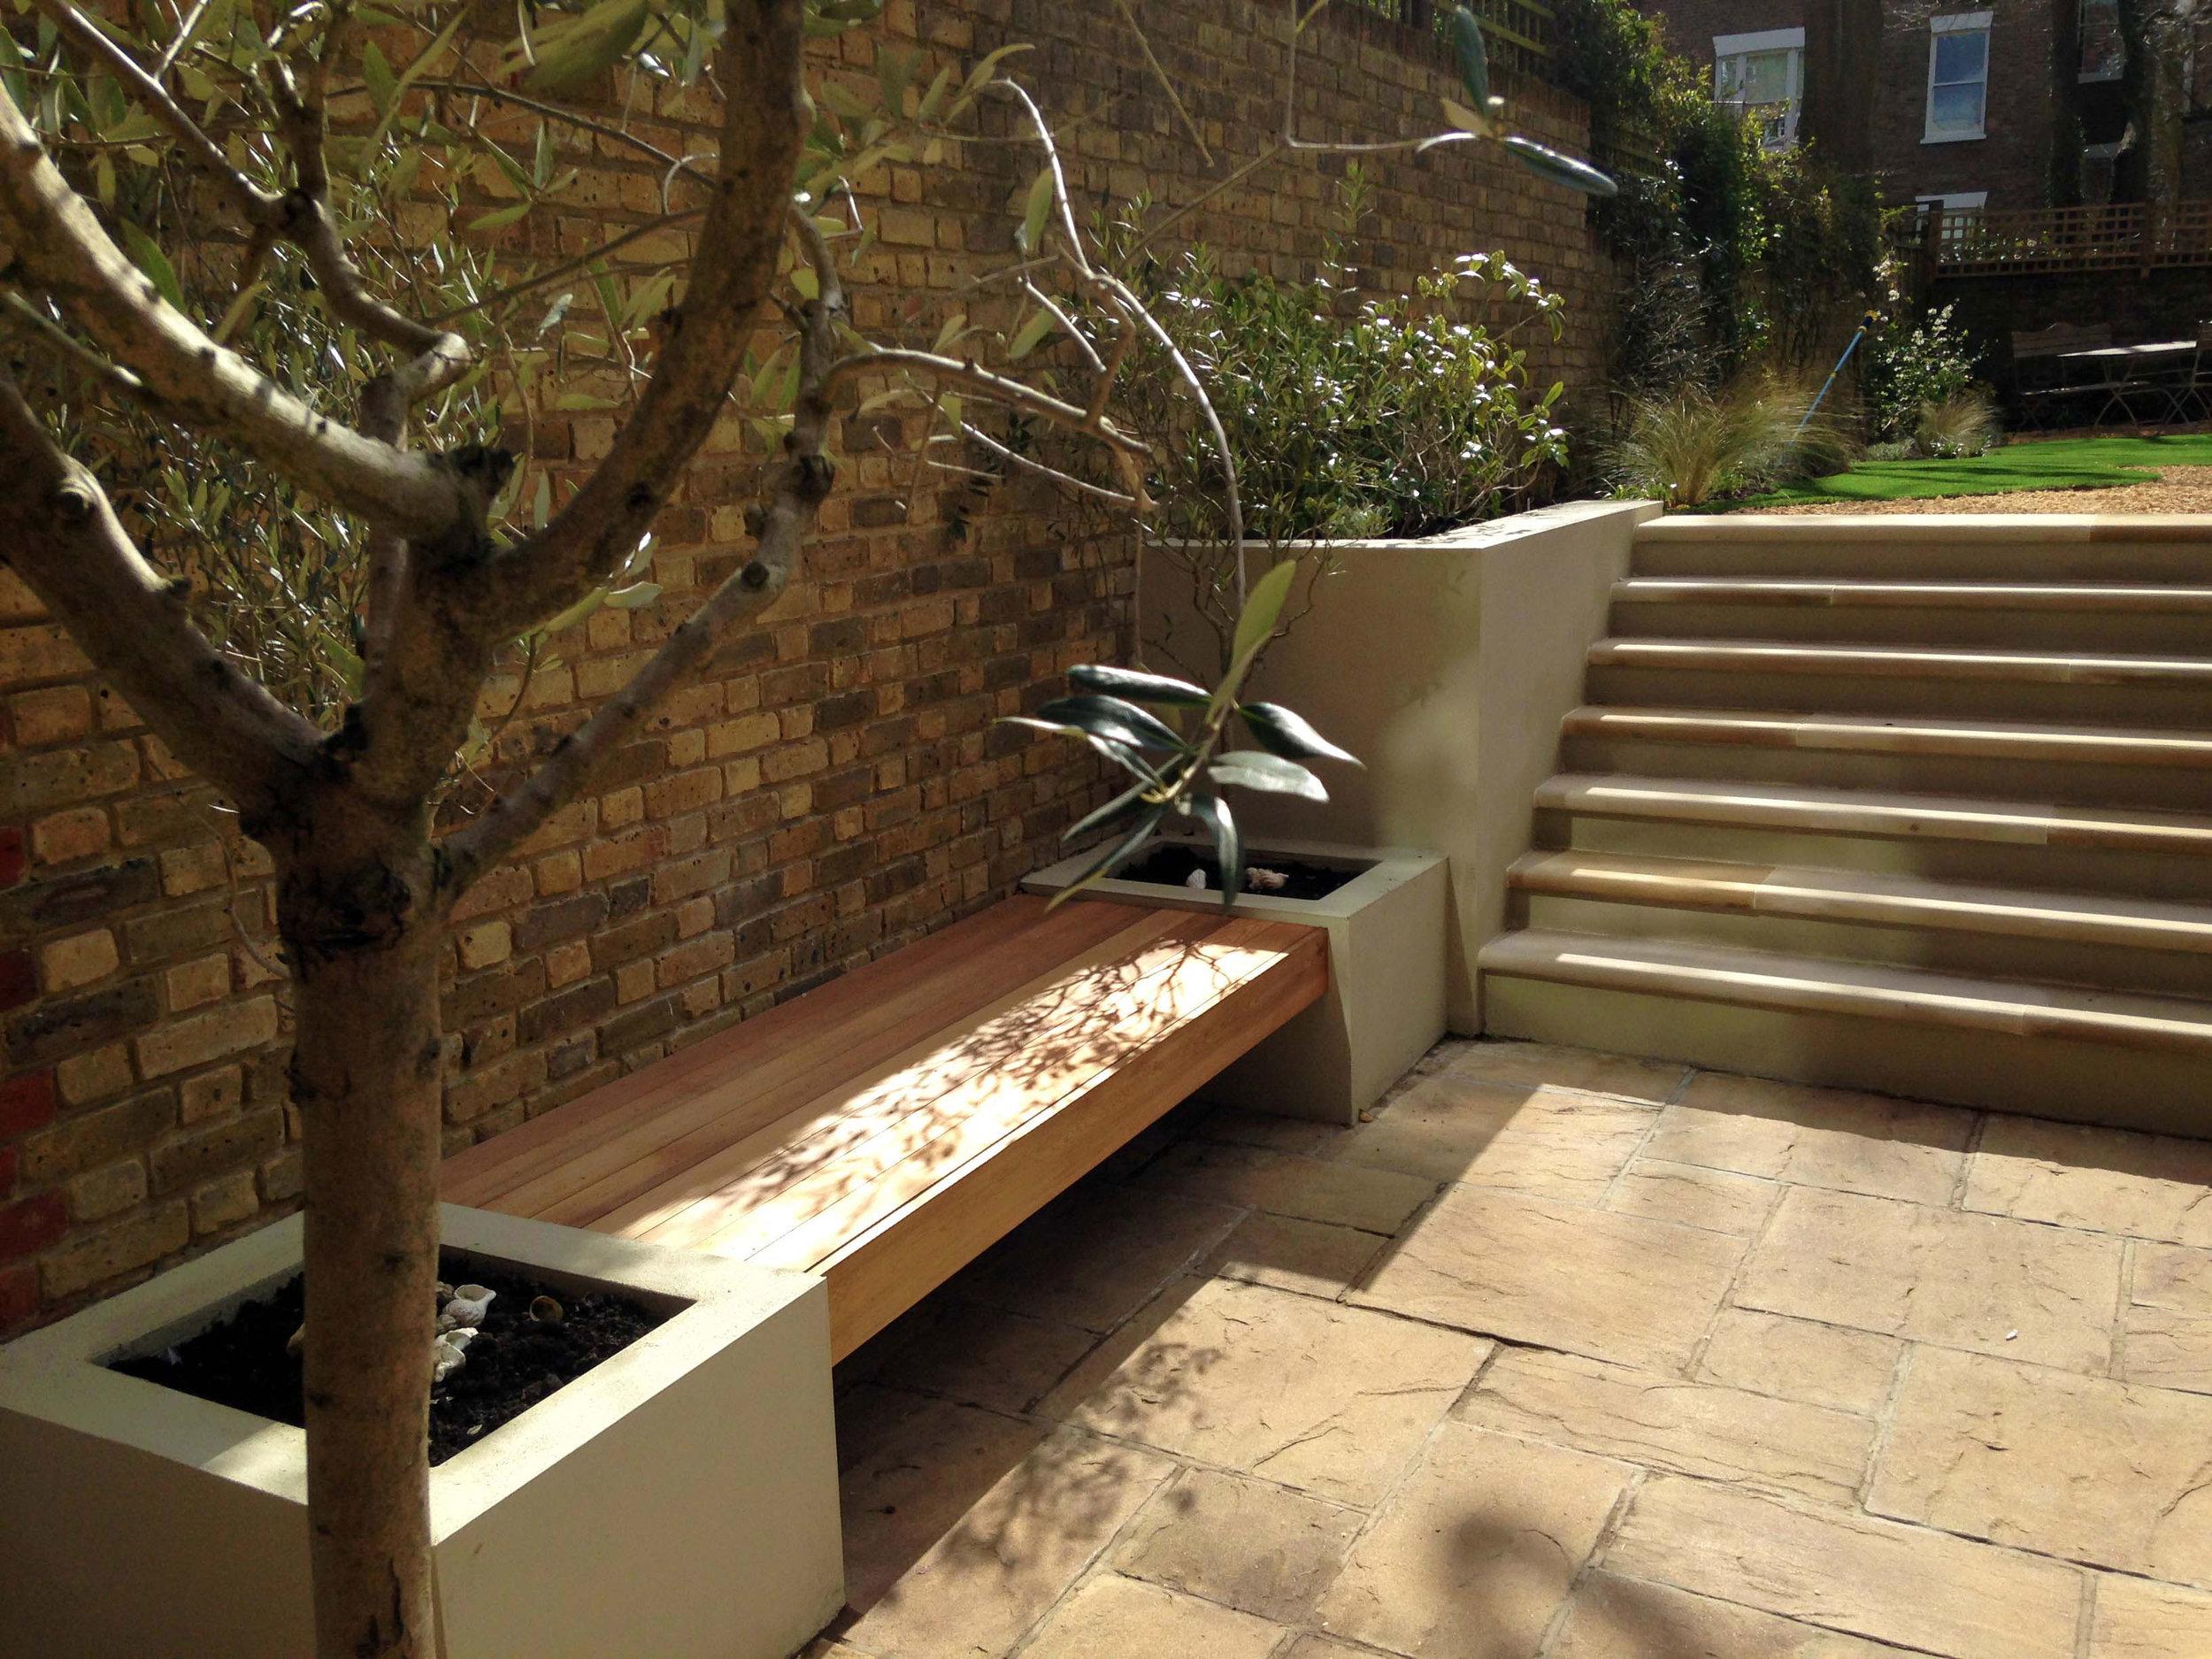 rendered-beds-cedar-bench---Gallagher-gardens---Landscaping-Oxford.jpg